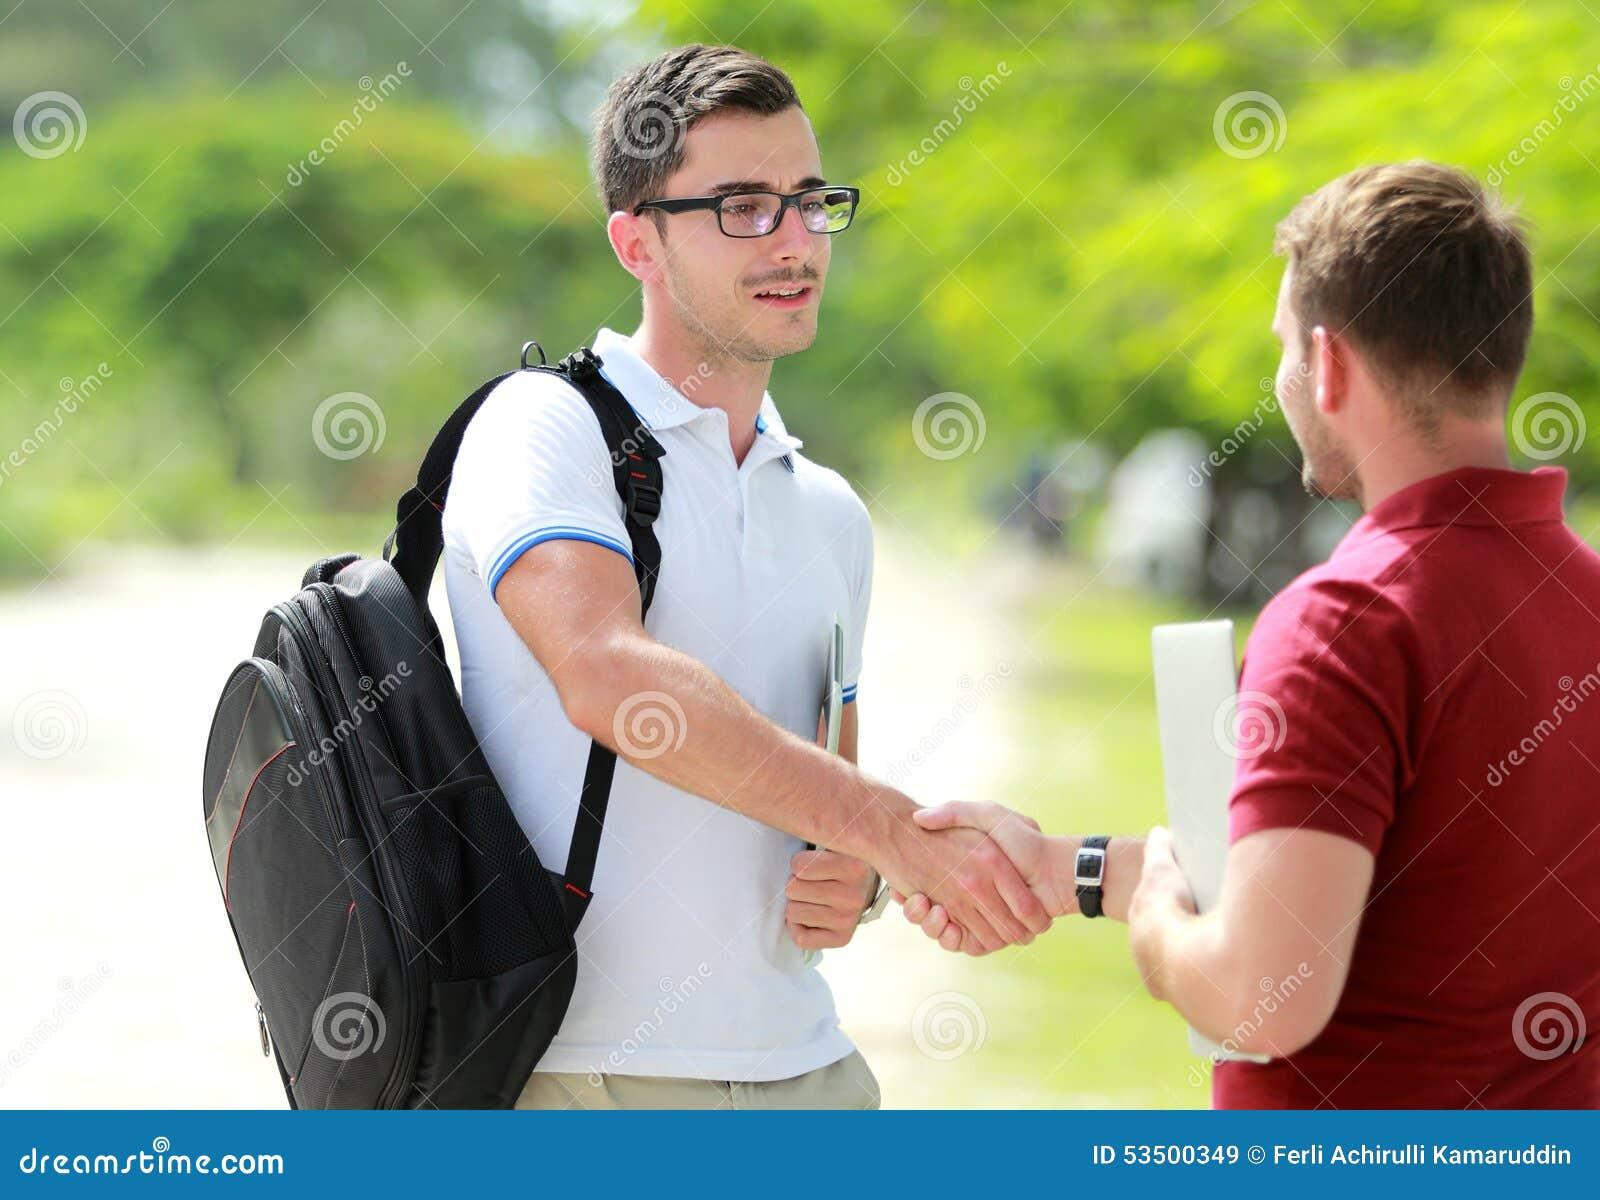 Hindu single men in college park